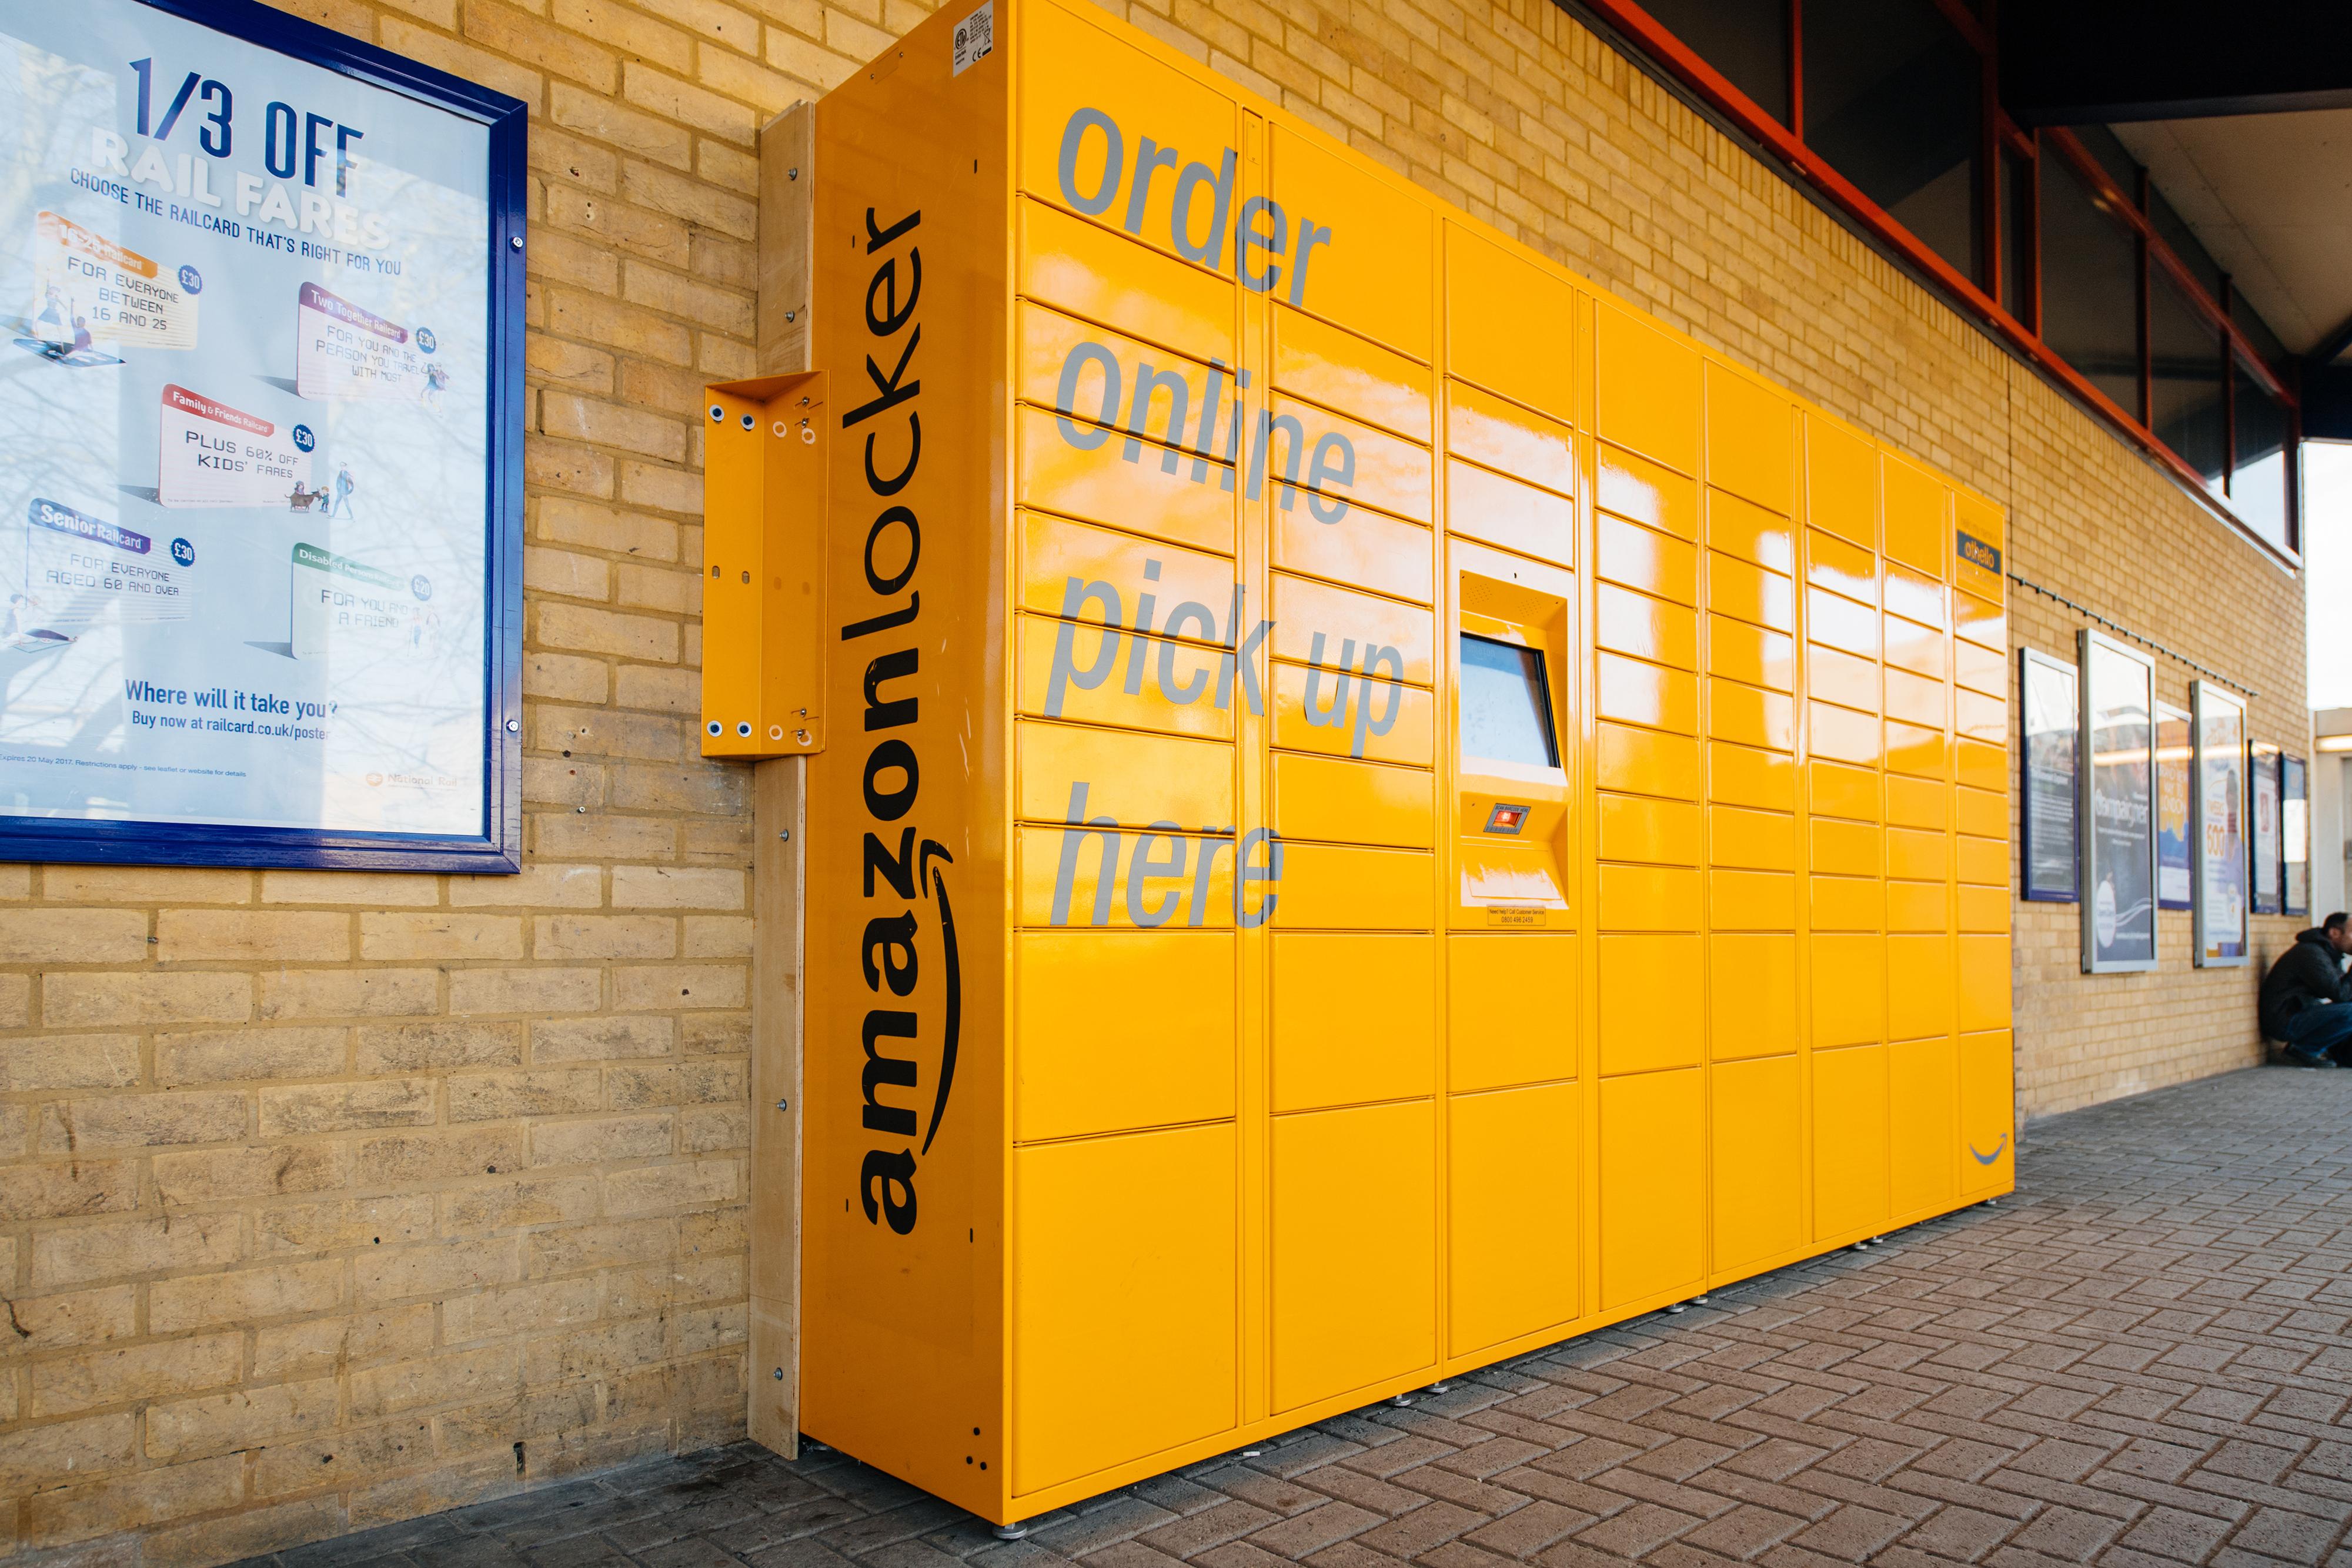 retail industry report market research amazon locker